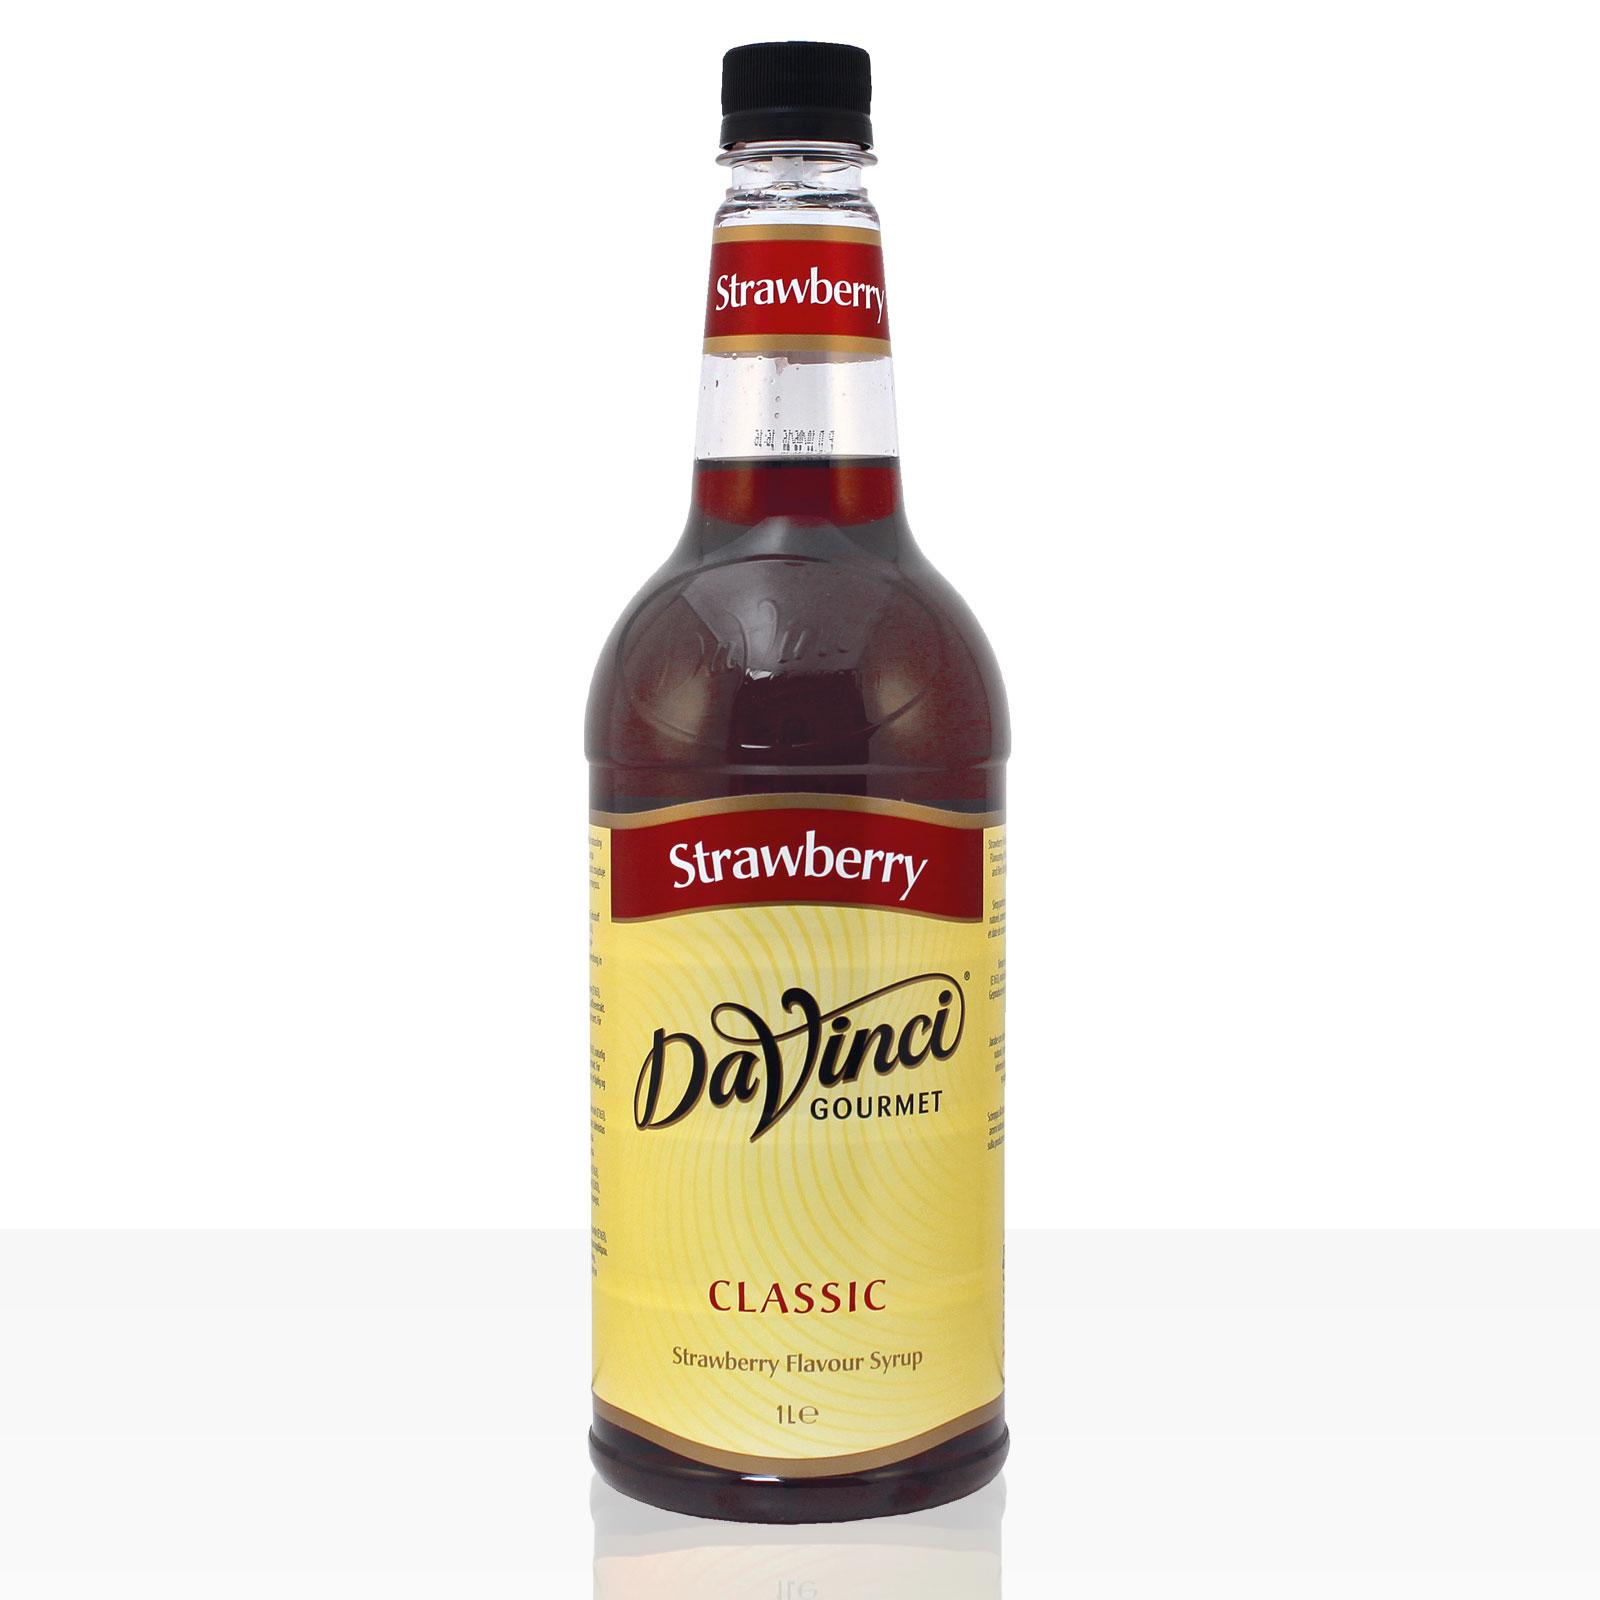 Da Vinci Gourmet Flavour Sirup Strawberry Erdbeer 1000ml Kaffeesirup